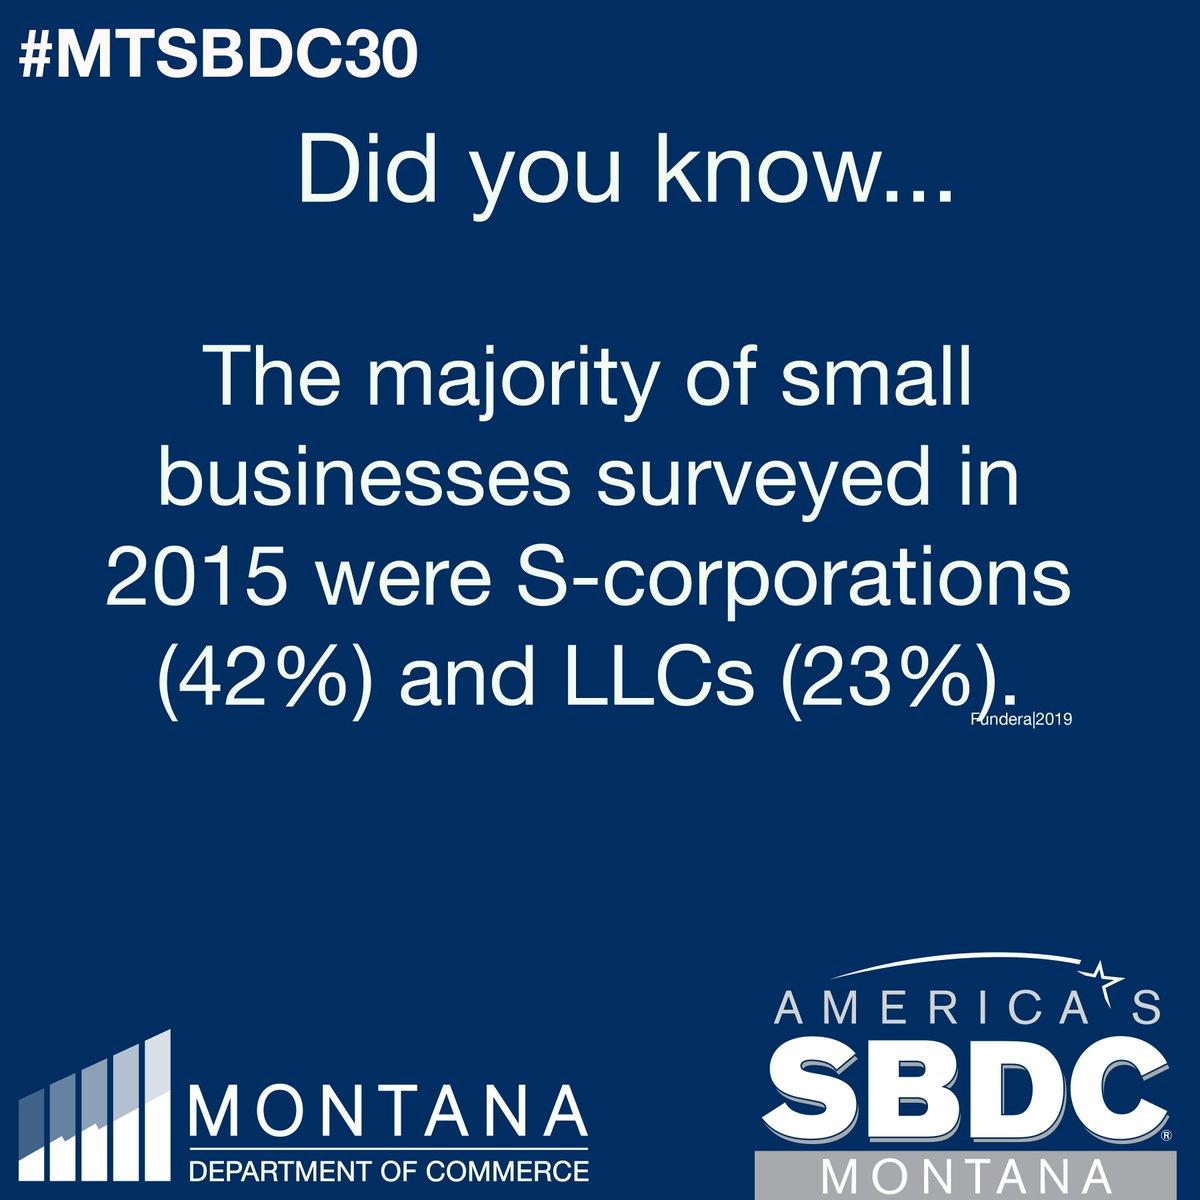 Montana SBDC (@mtsbdc) | Twitter